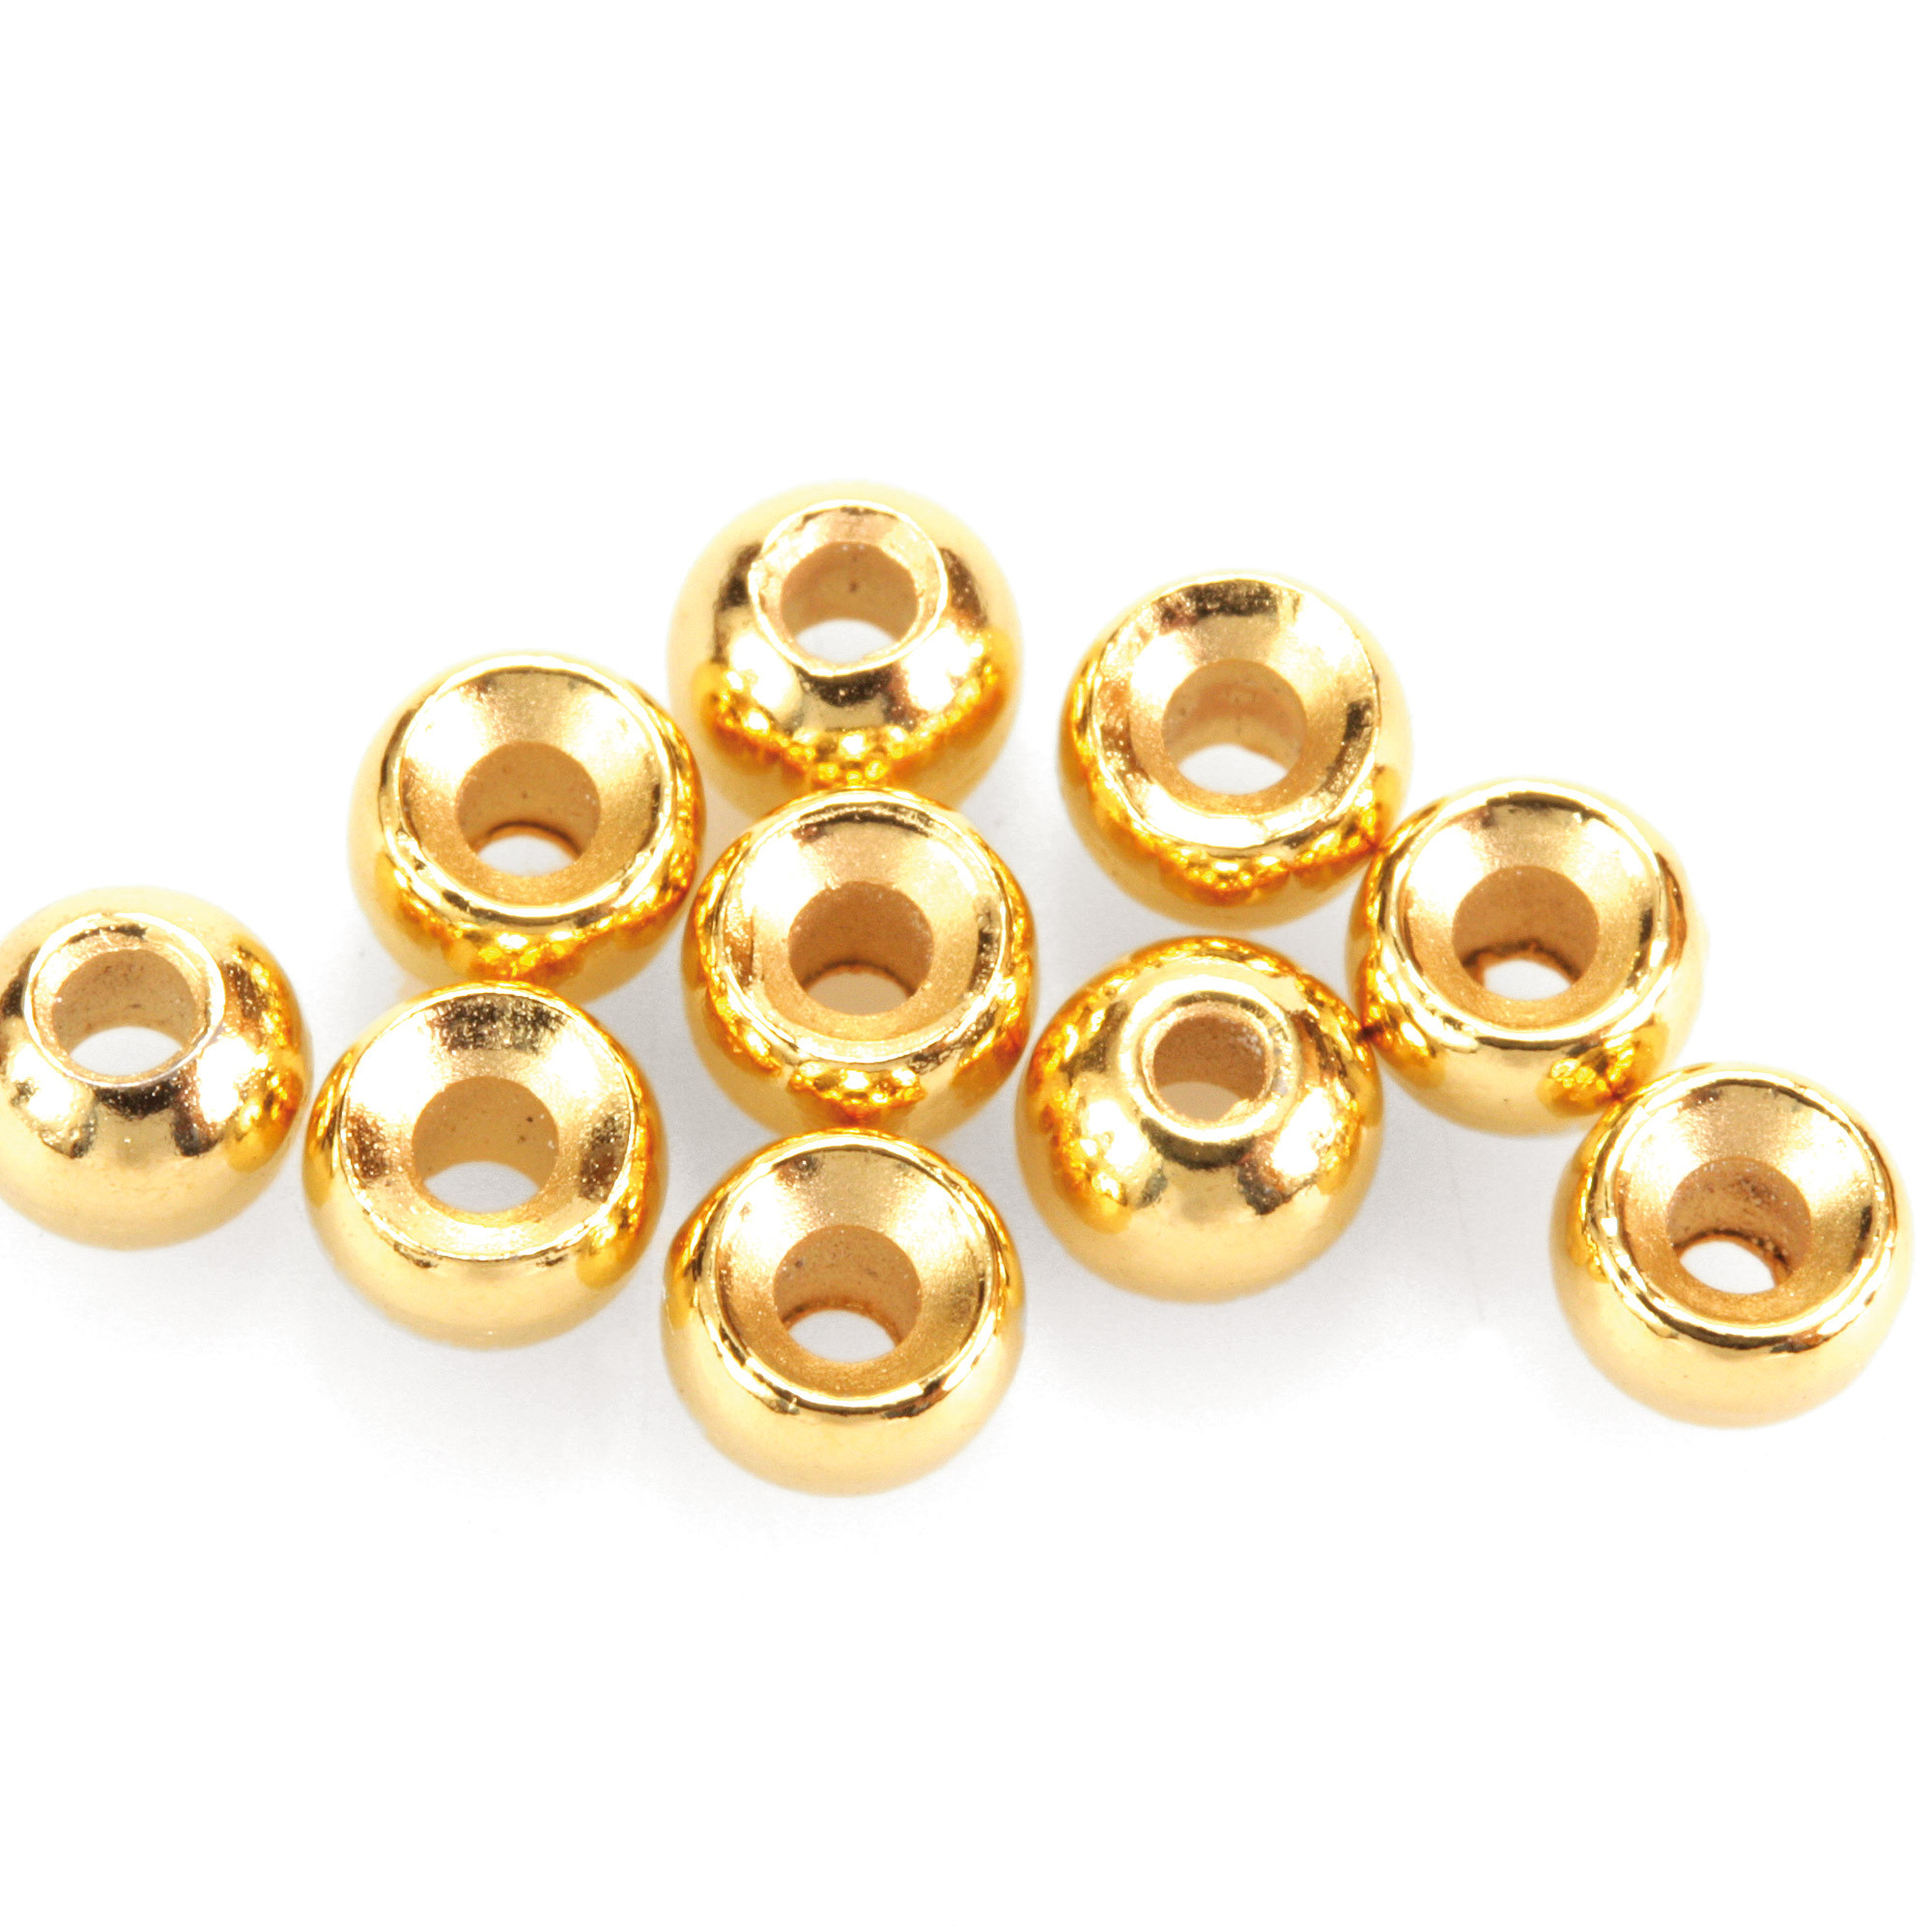 gelb Fliegenbinden Standard Perlen Tungsten Standard Beads